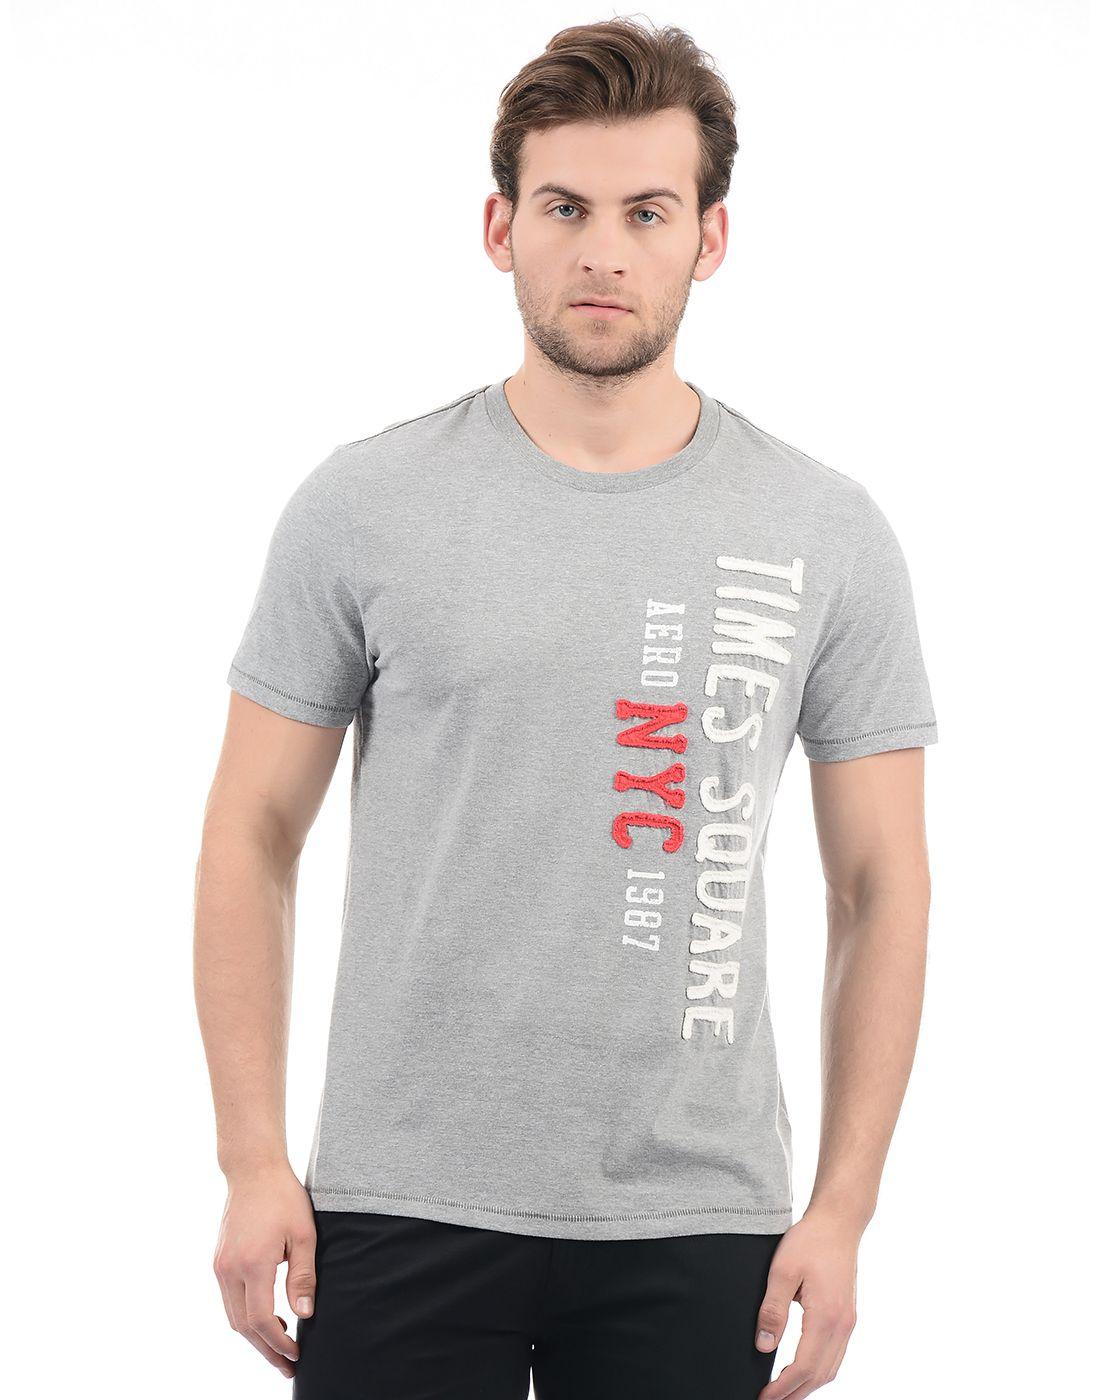 Aeropostale Grey Round T-Shirt